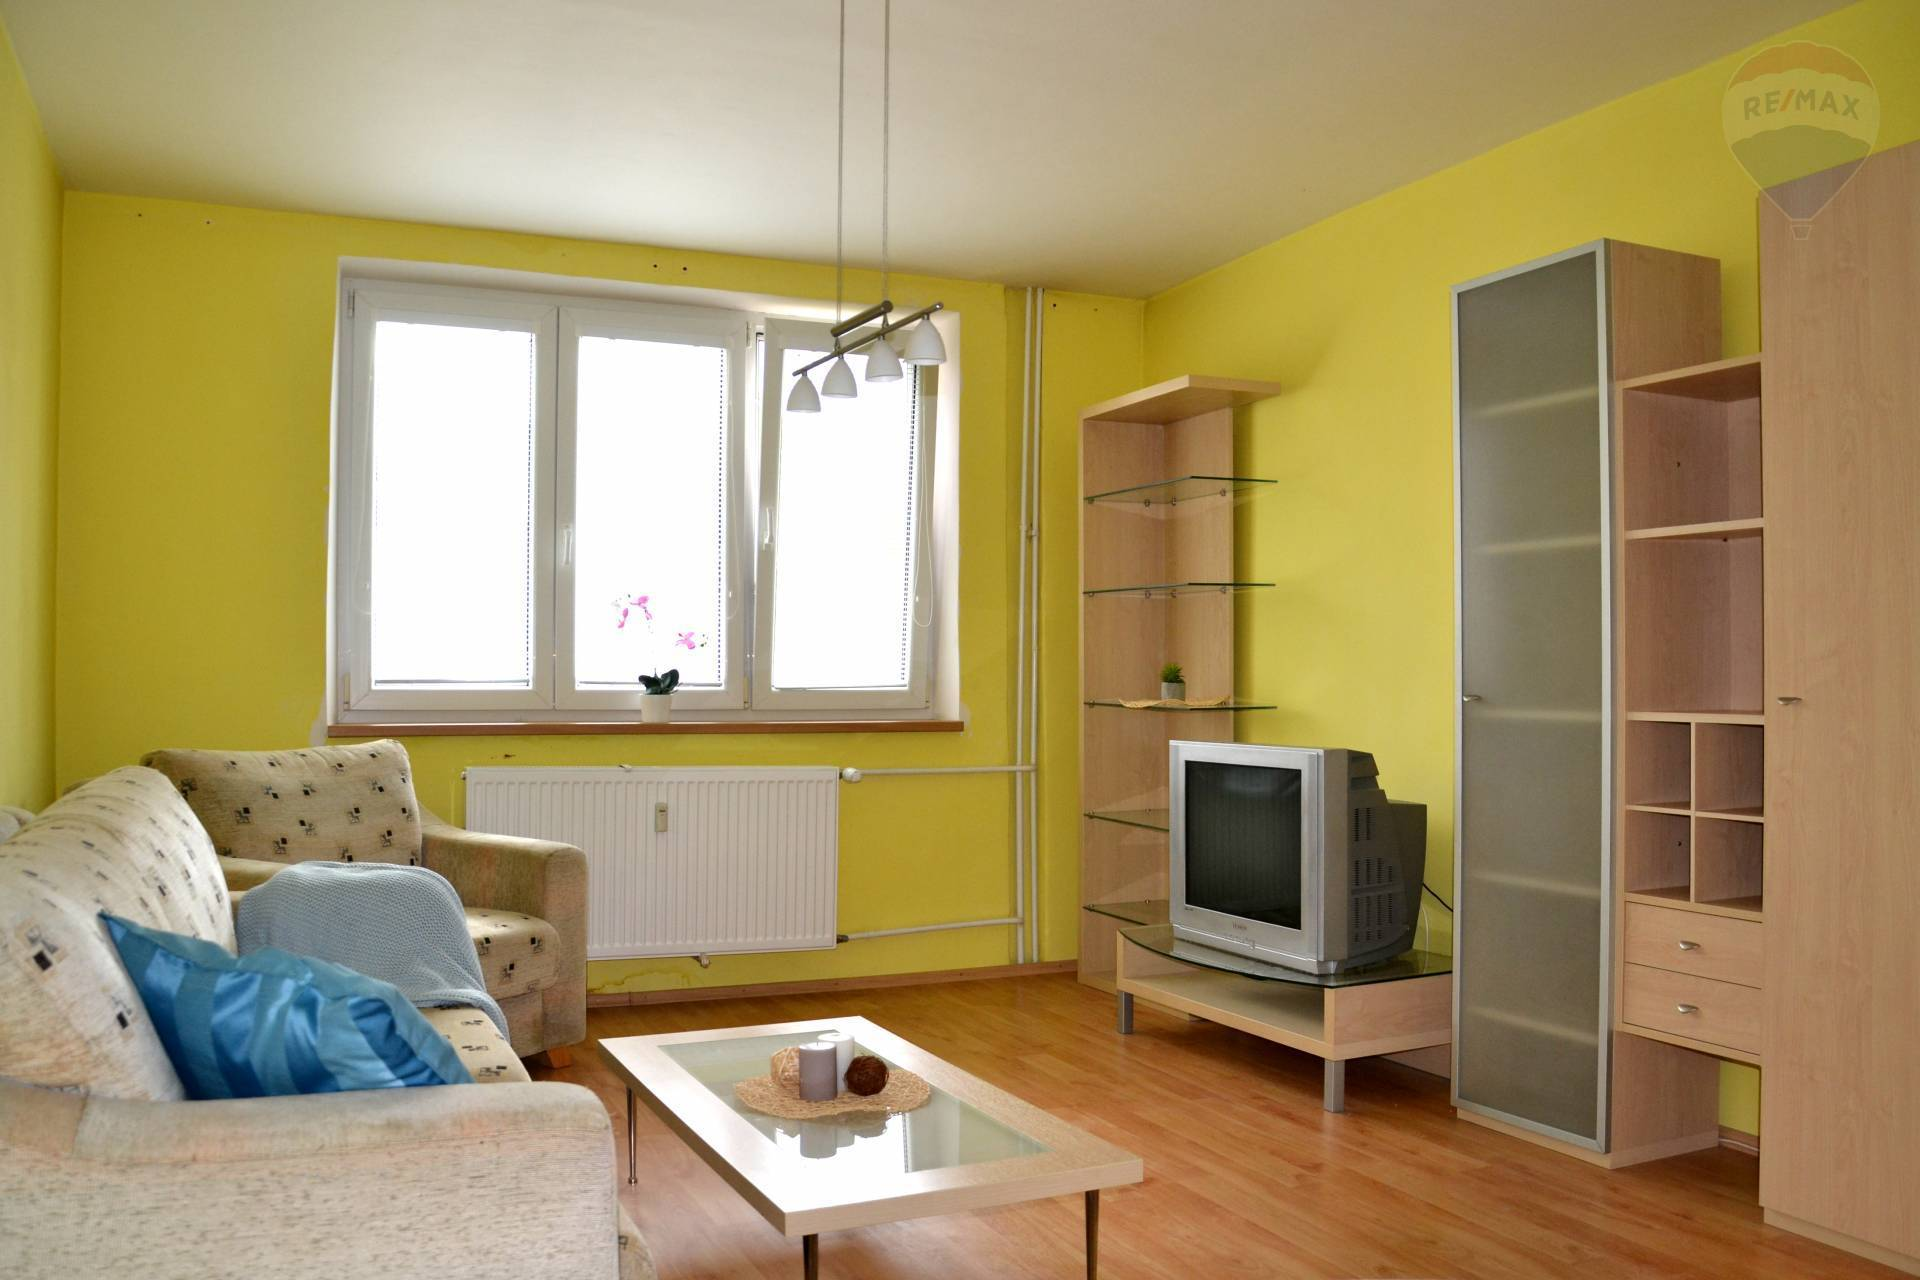 Predaj 2 izb. bytu, Legionárska ulica